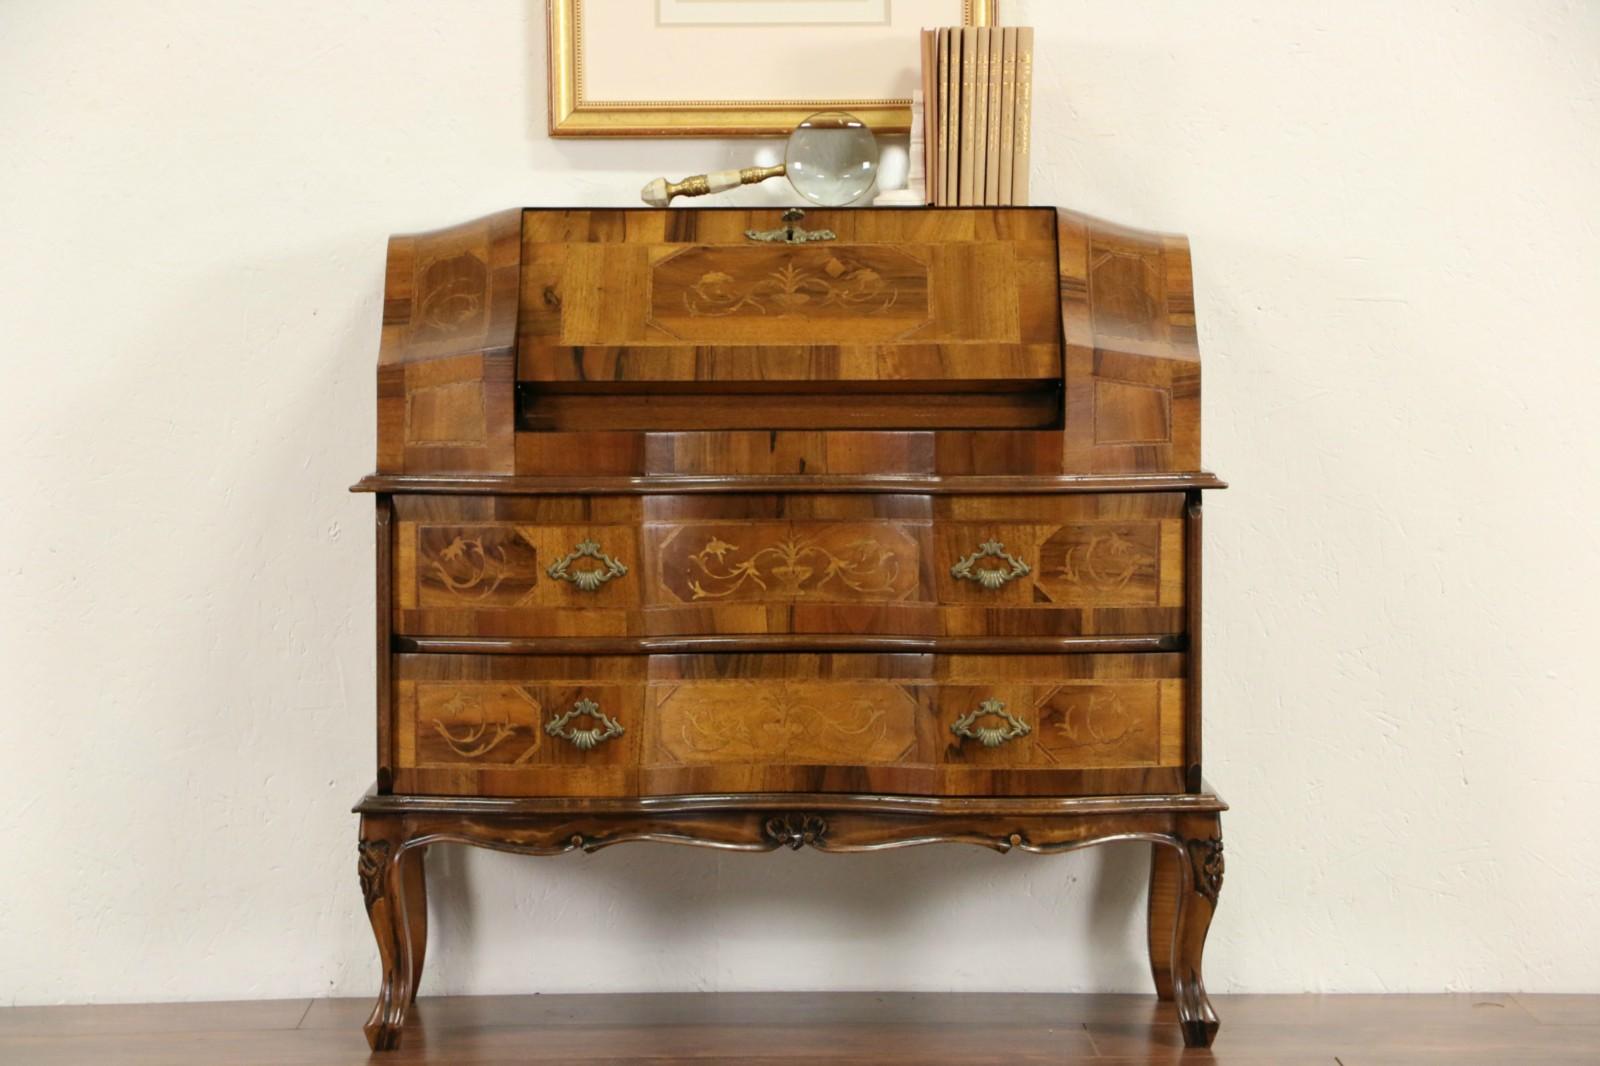 treasures furniture pre goodsvintage owned minor desk vintage home gently secretary